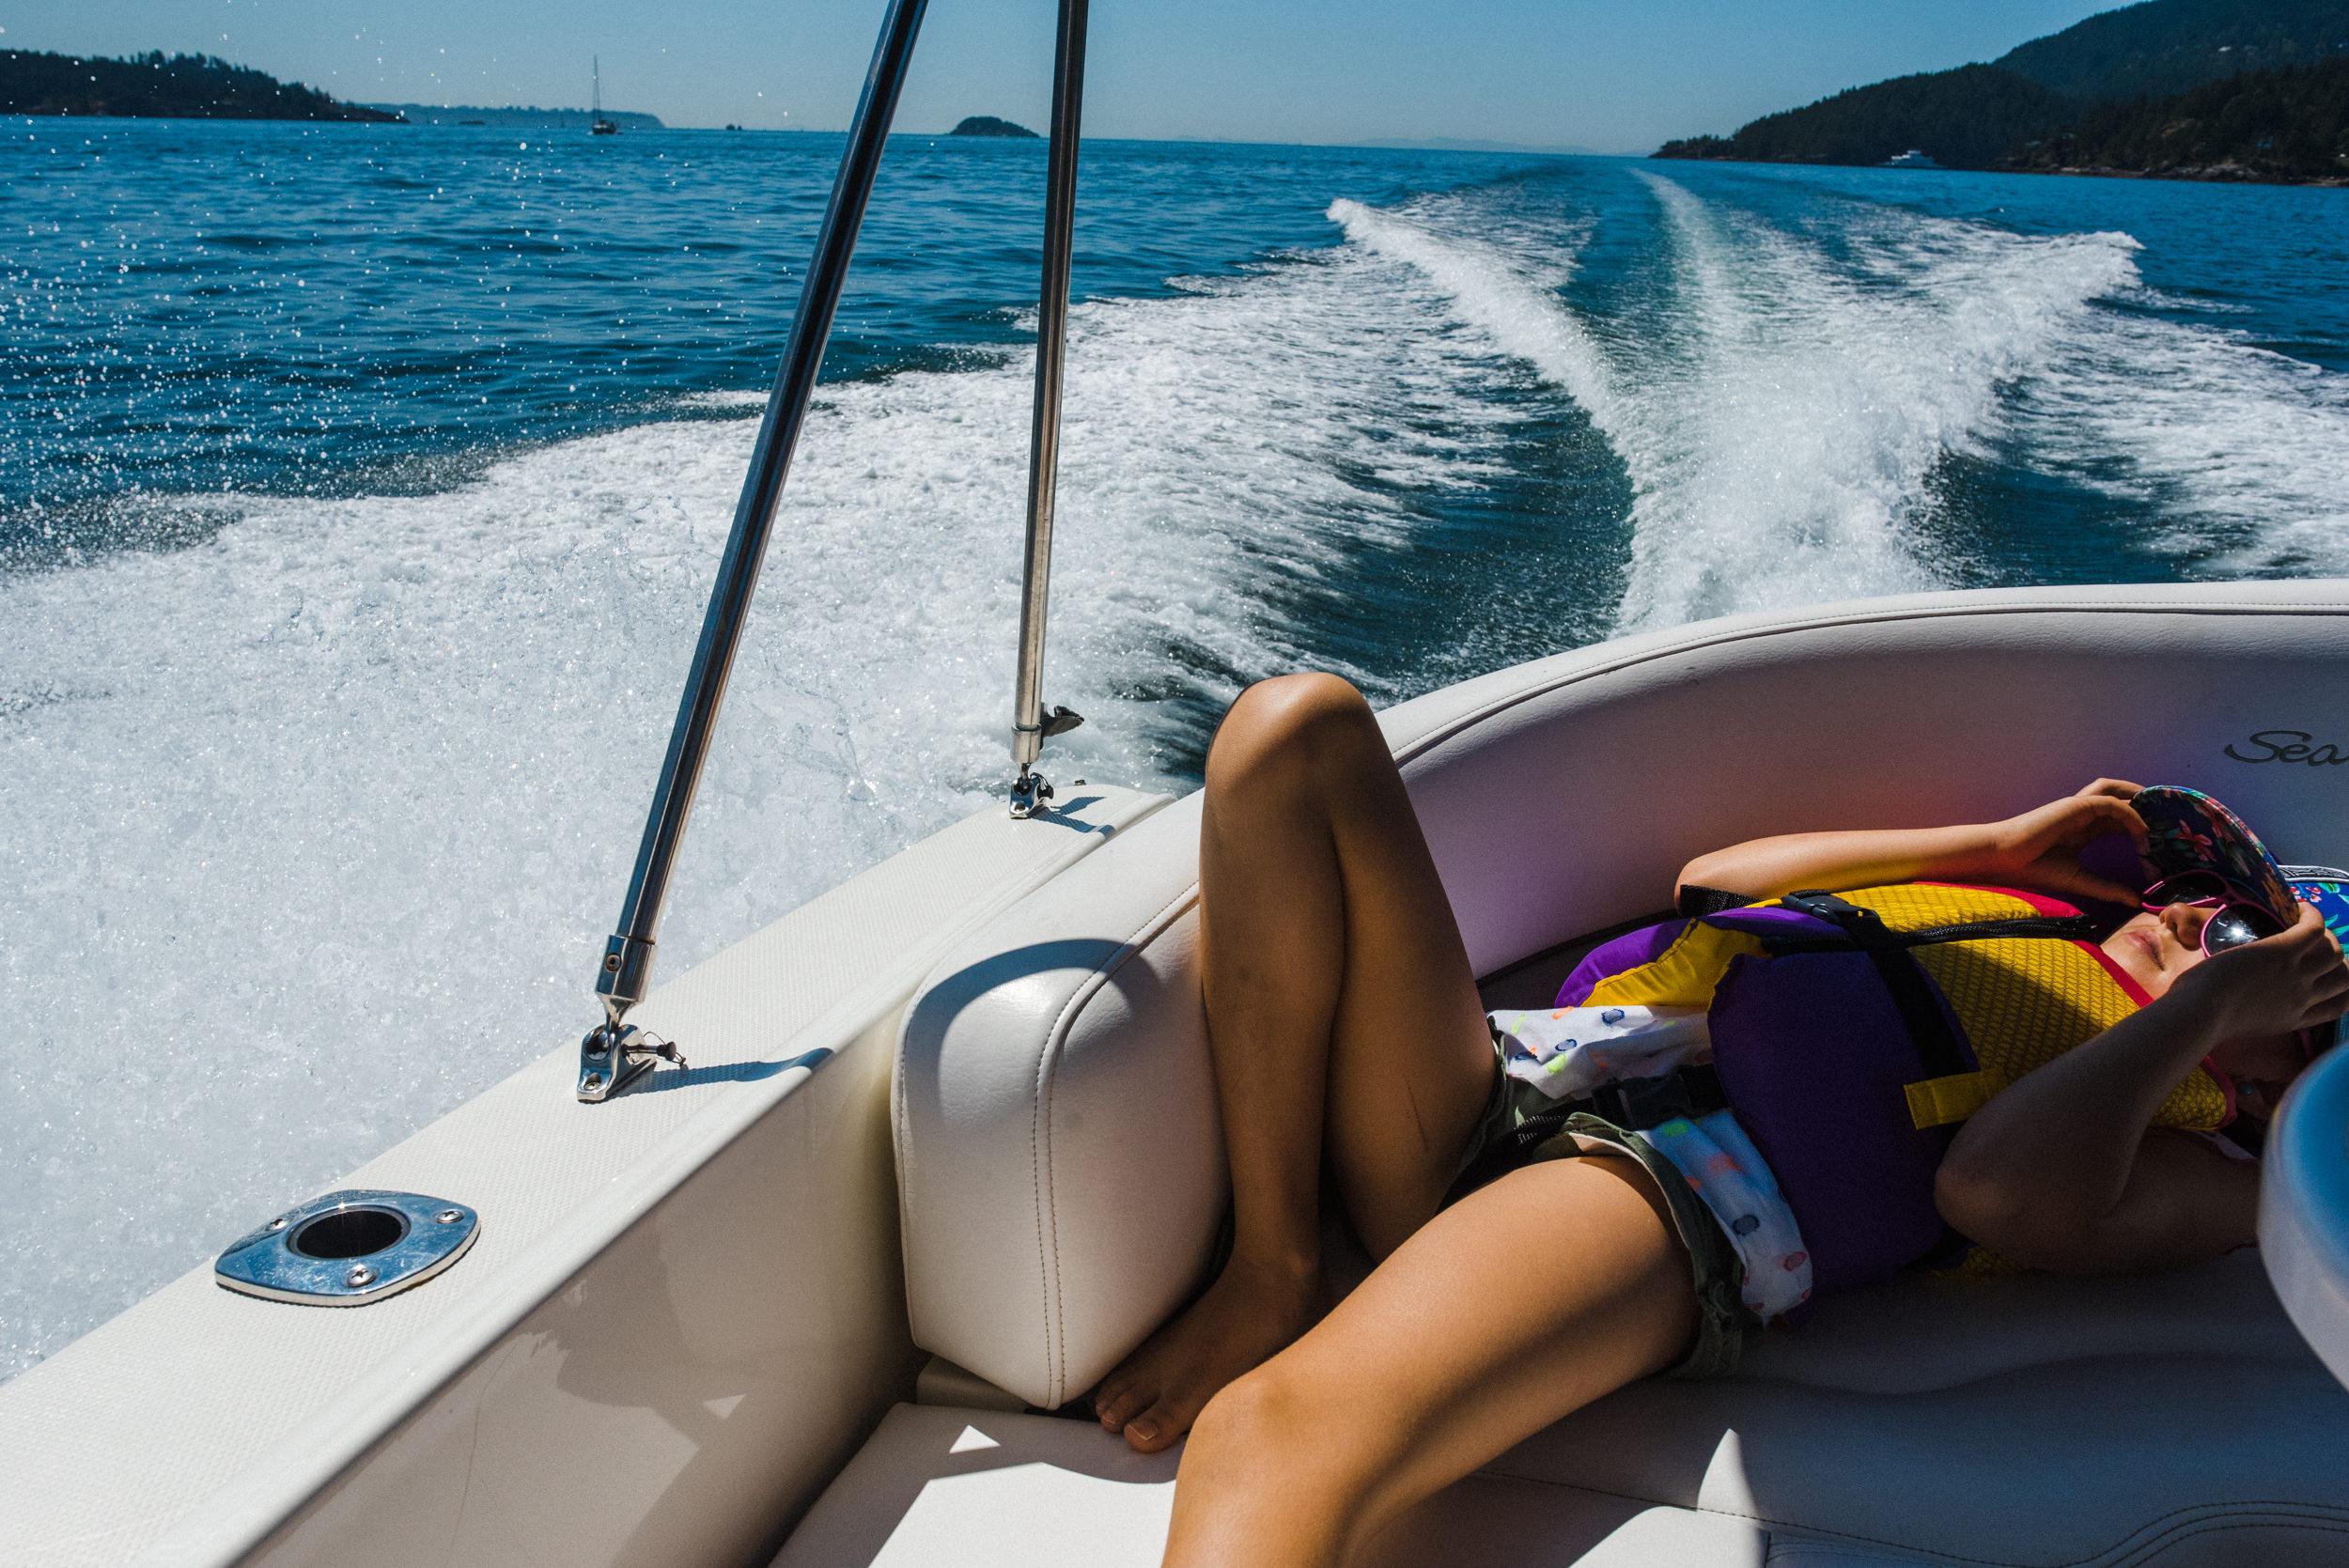 girl enjoying the sun and splash while lying on the boat seat